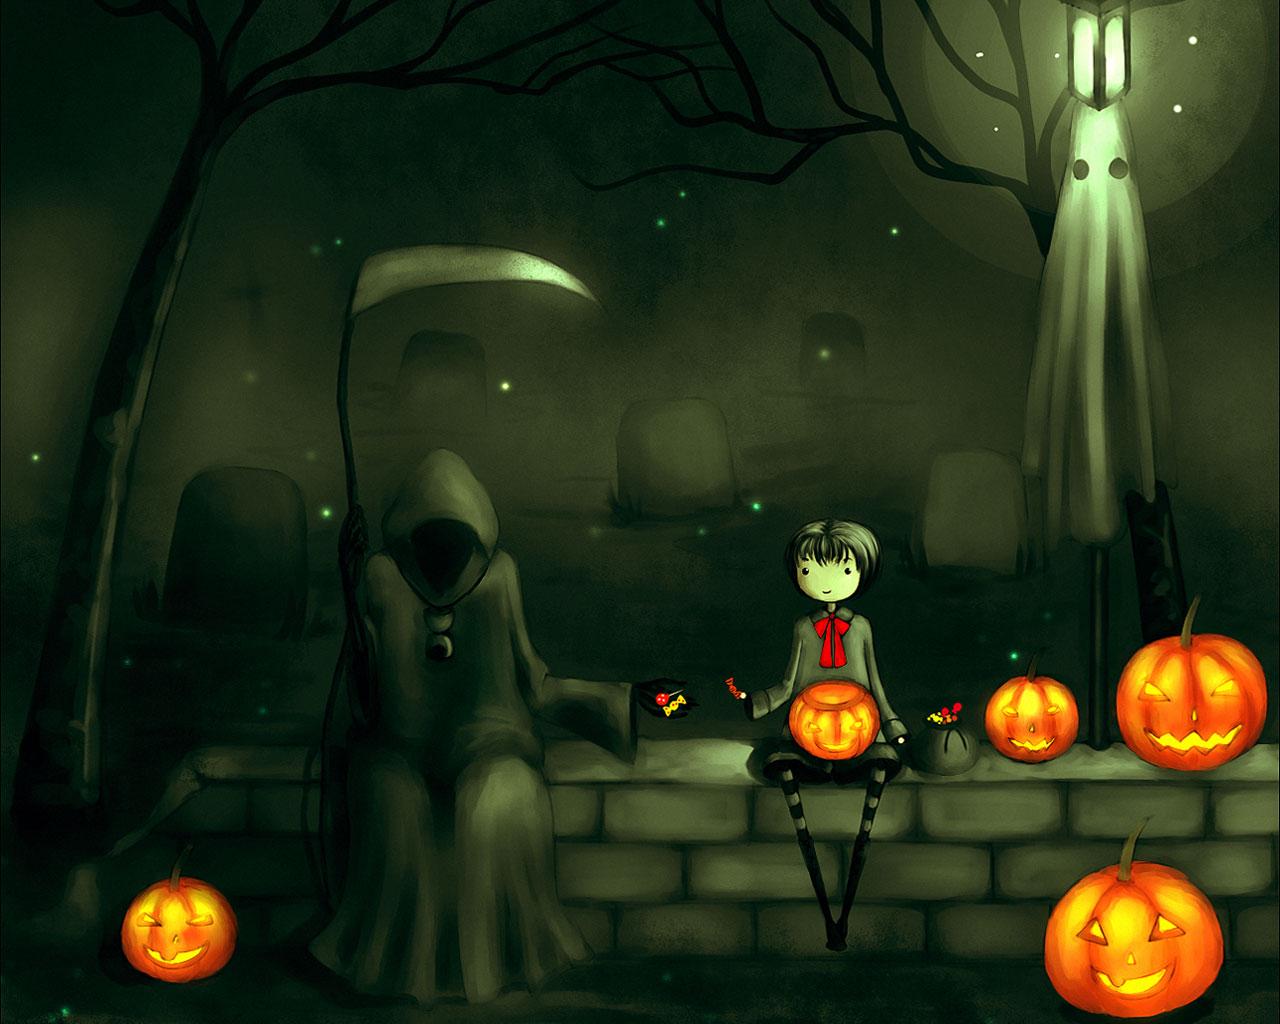 Cute Halloween 2014 HD Wallpapers 1280x1024